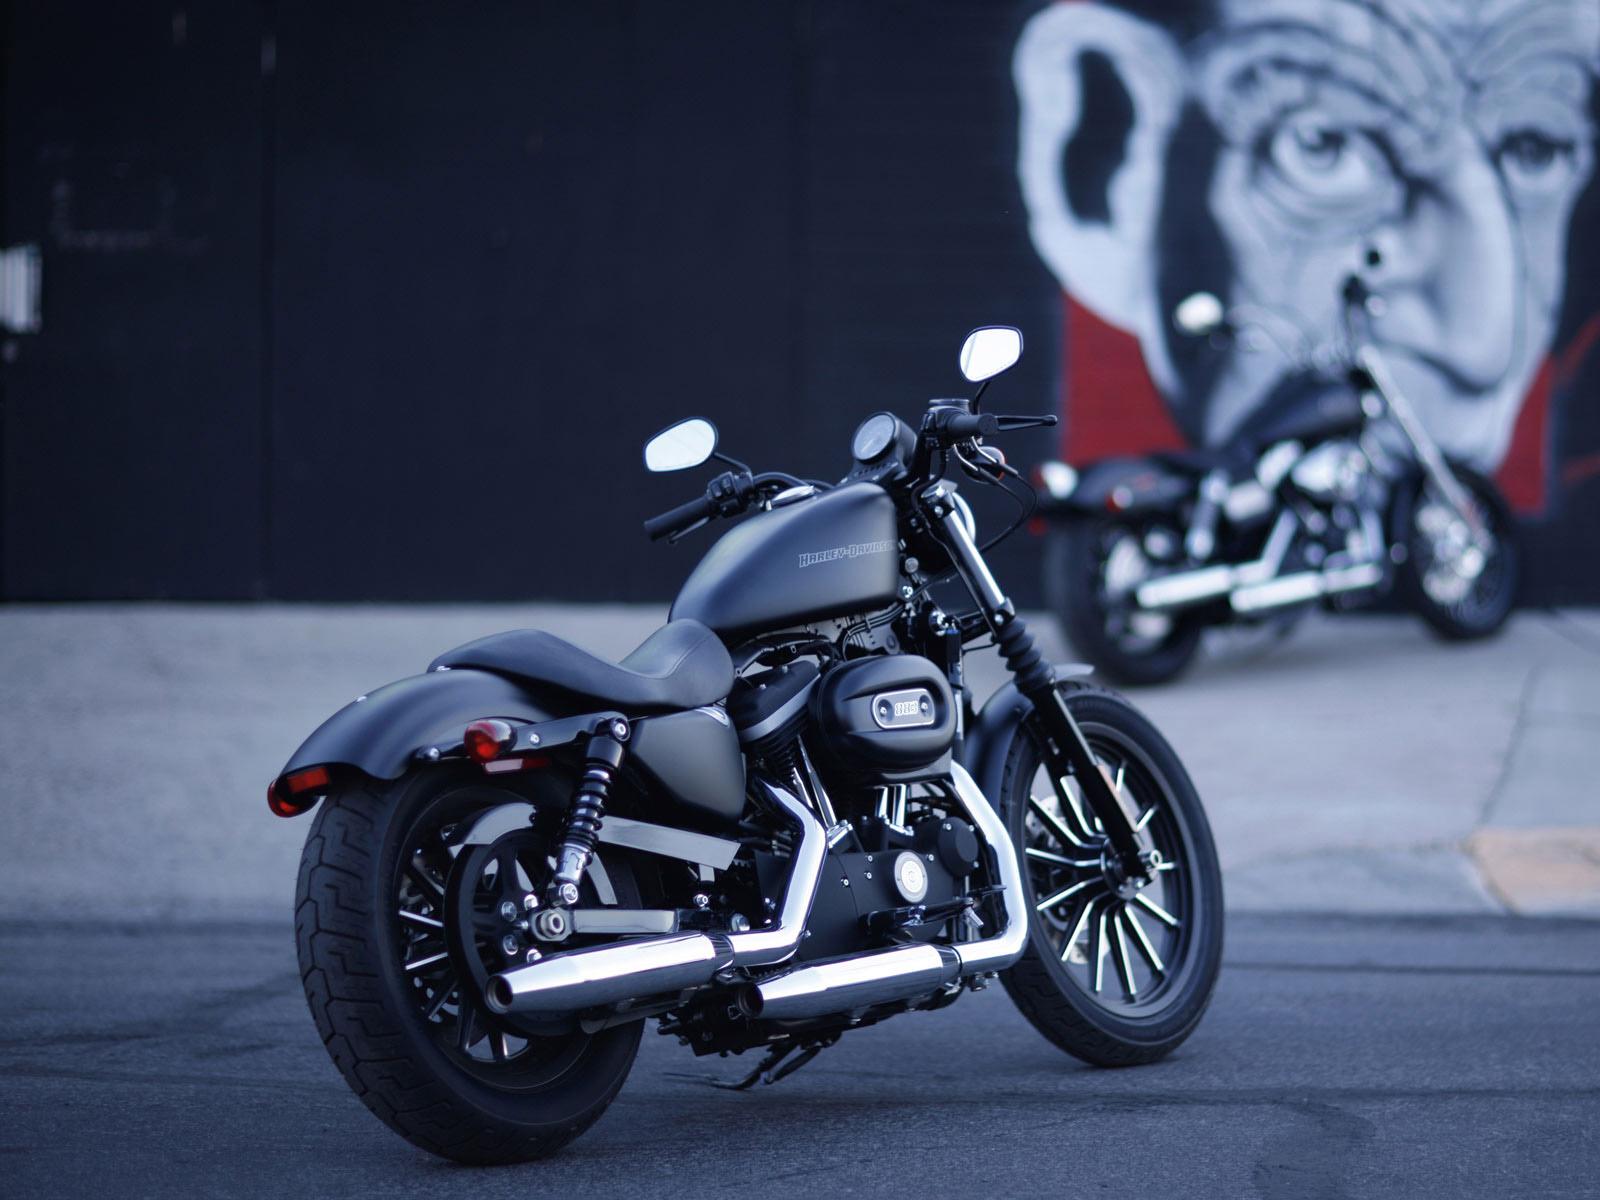 Harley-Davidson-Motocyle-full-HD-Wallpaper-04